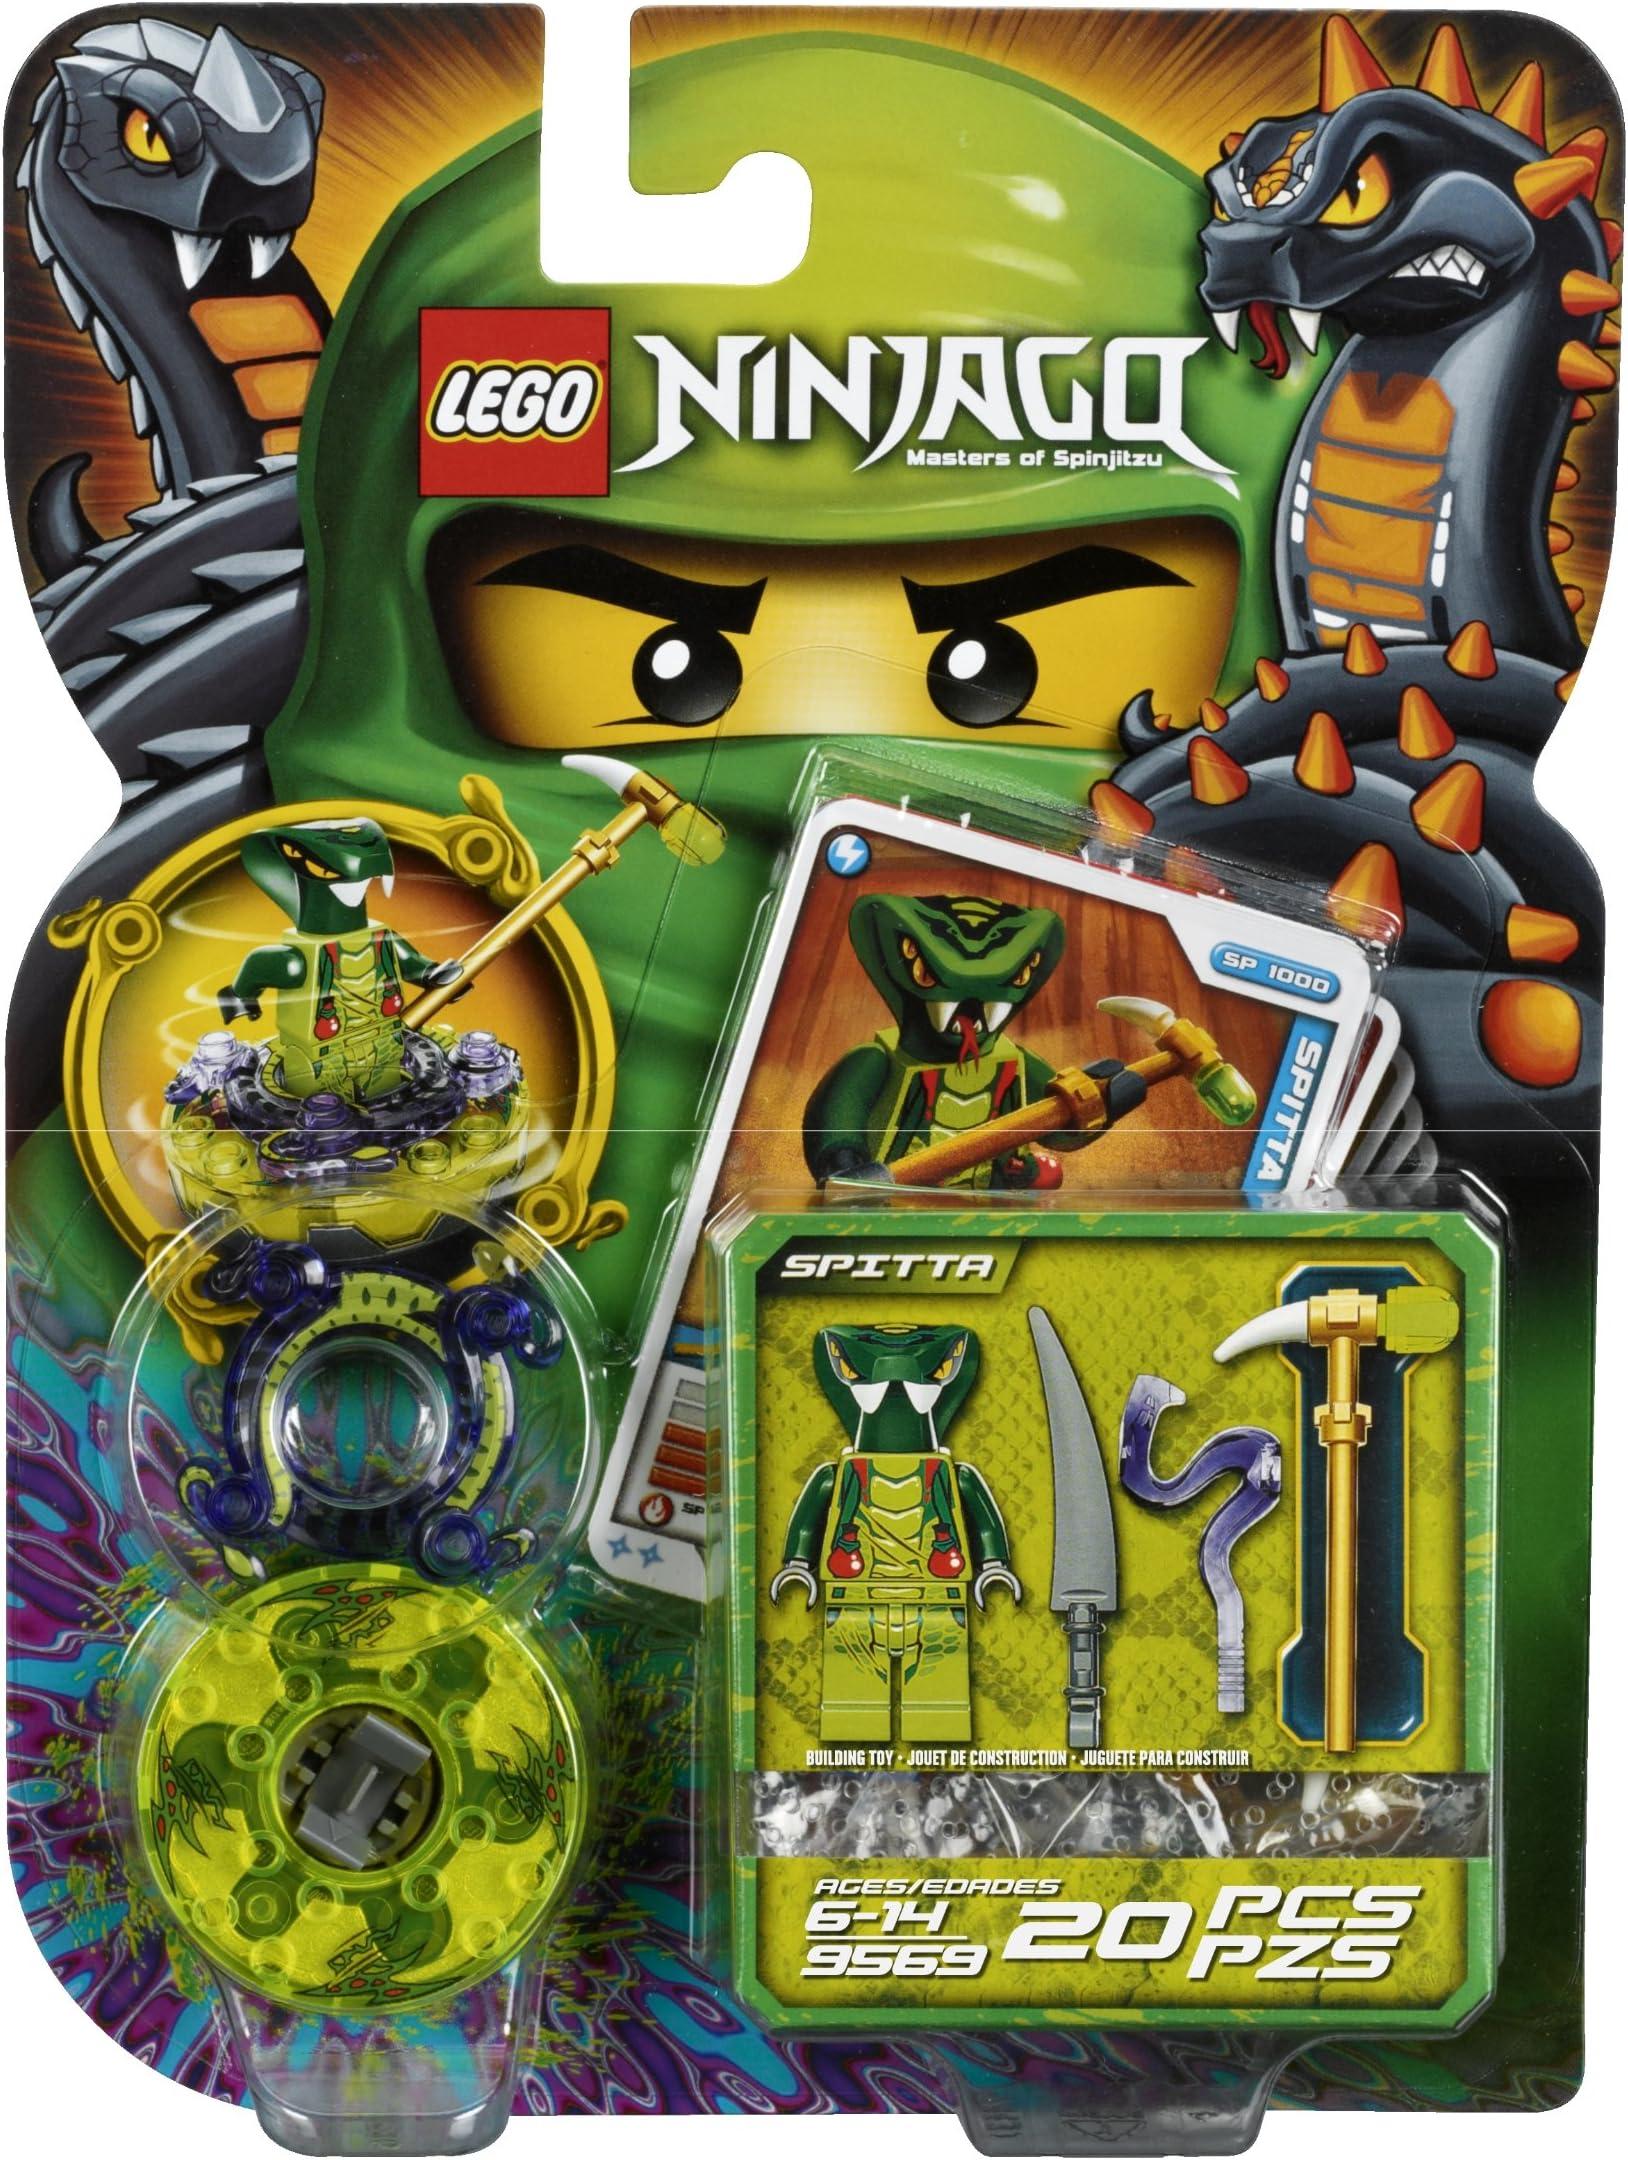 Lot of 2 Ninjago Lego Booster Packs JAY ZX 9553 LIZARU 9557 New Sealed